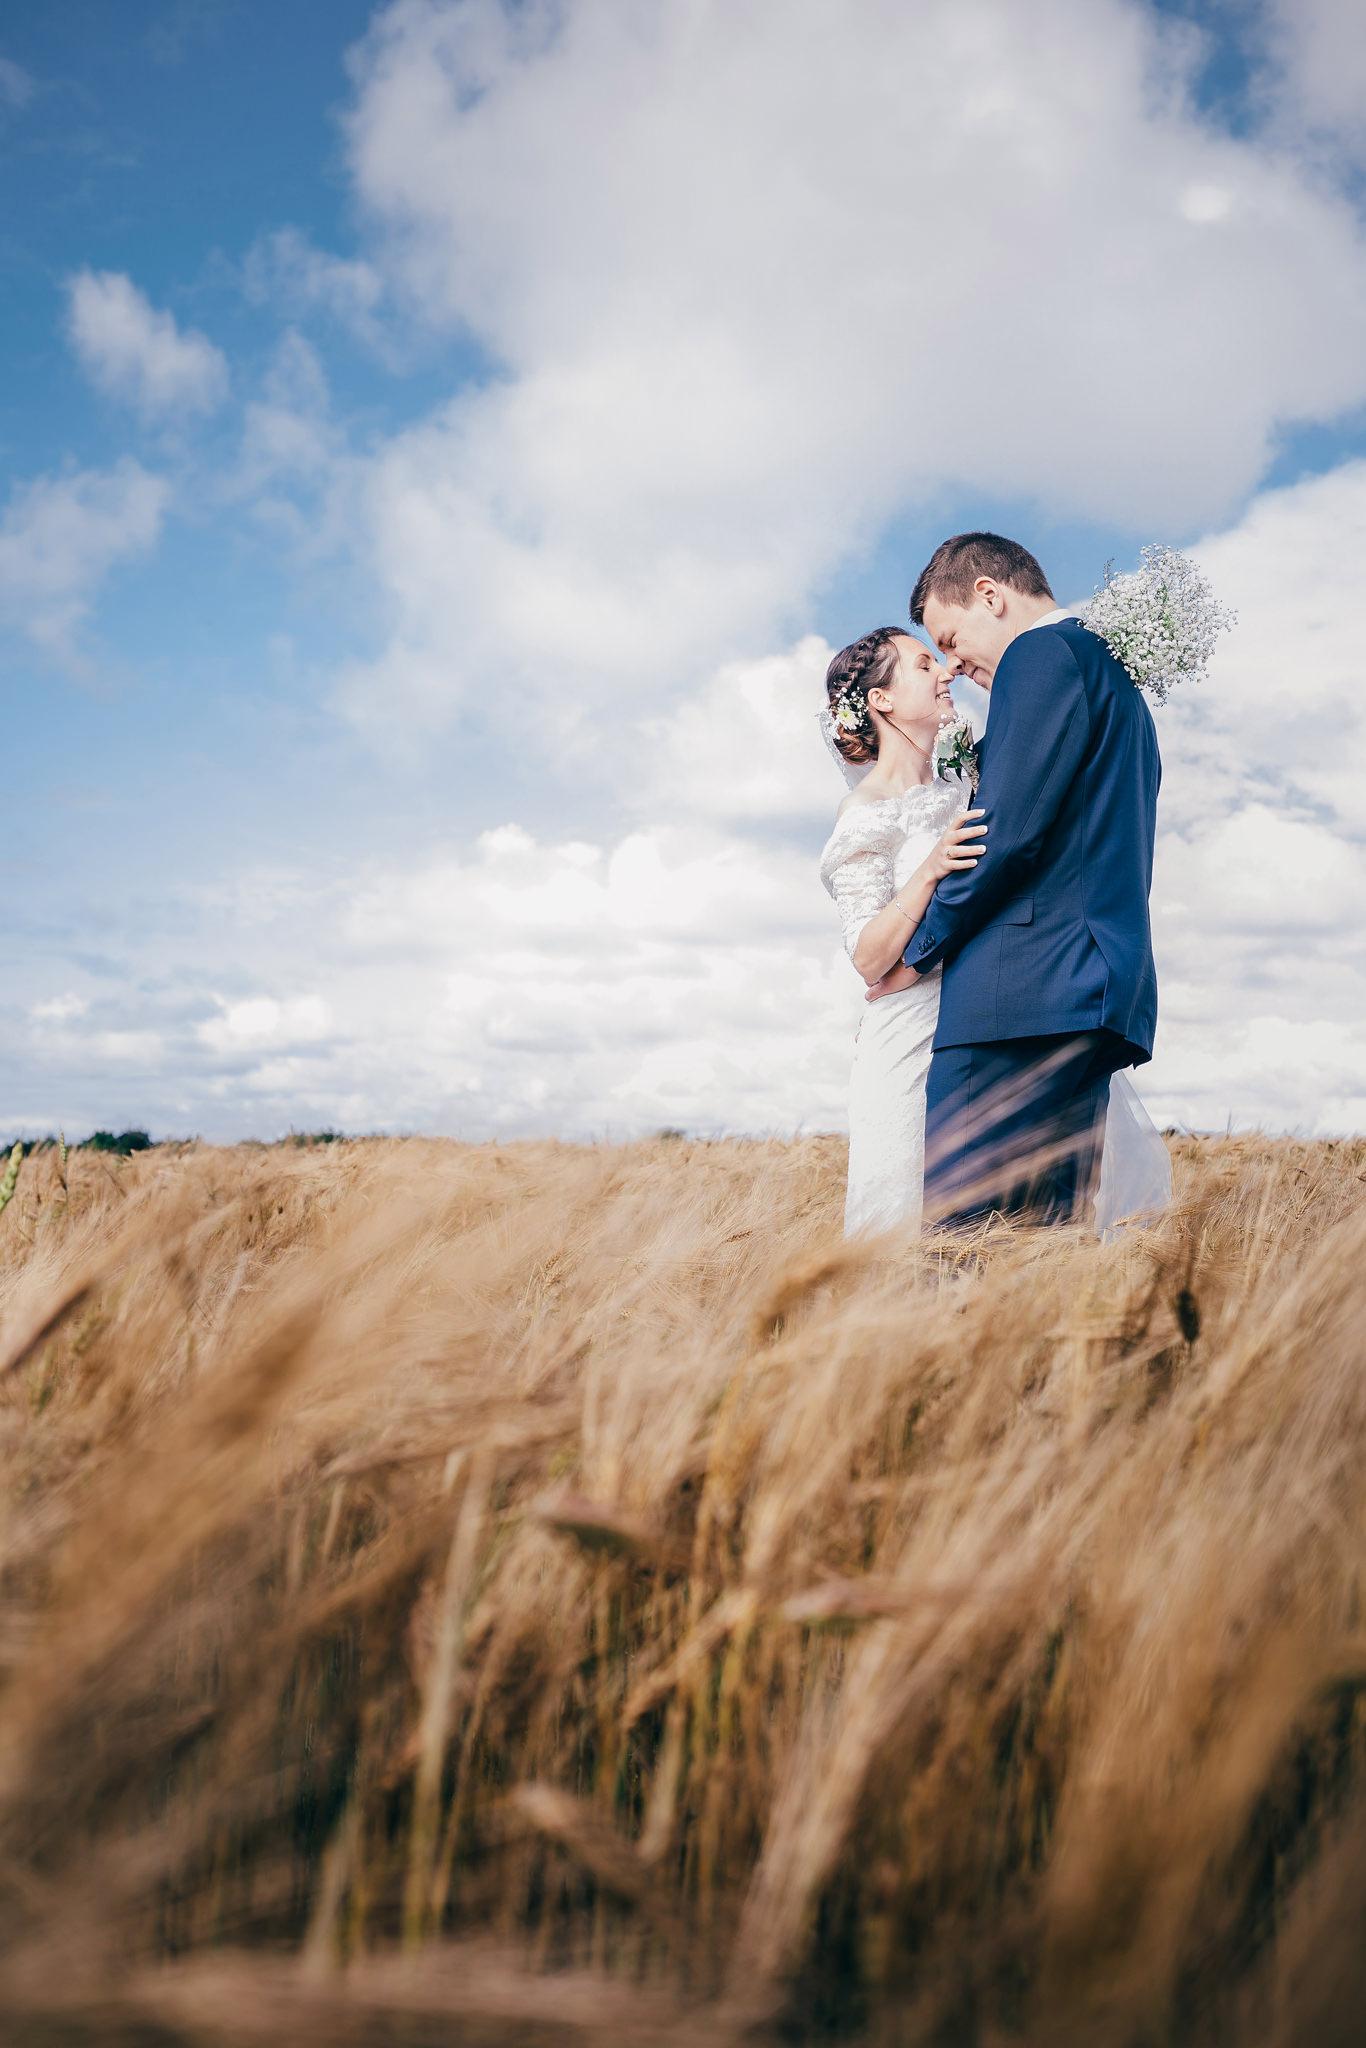 Norway+wedding+photographer+elopement+pre+wedding+Casey+Arneson-90.jpg